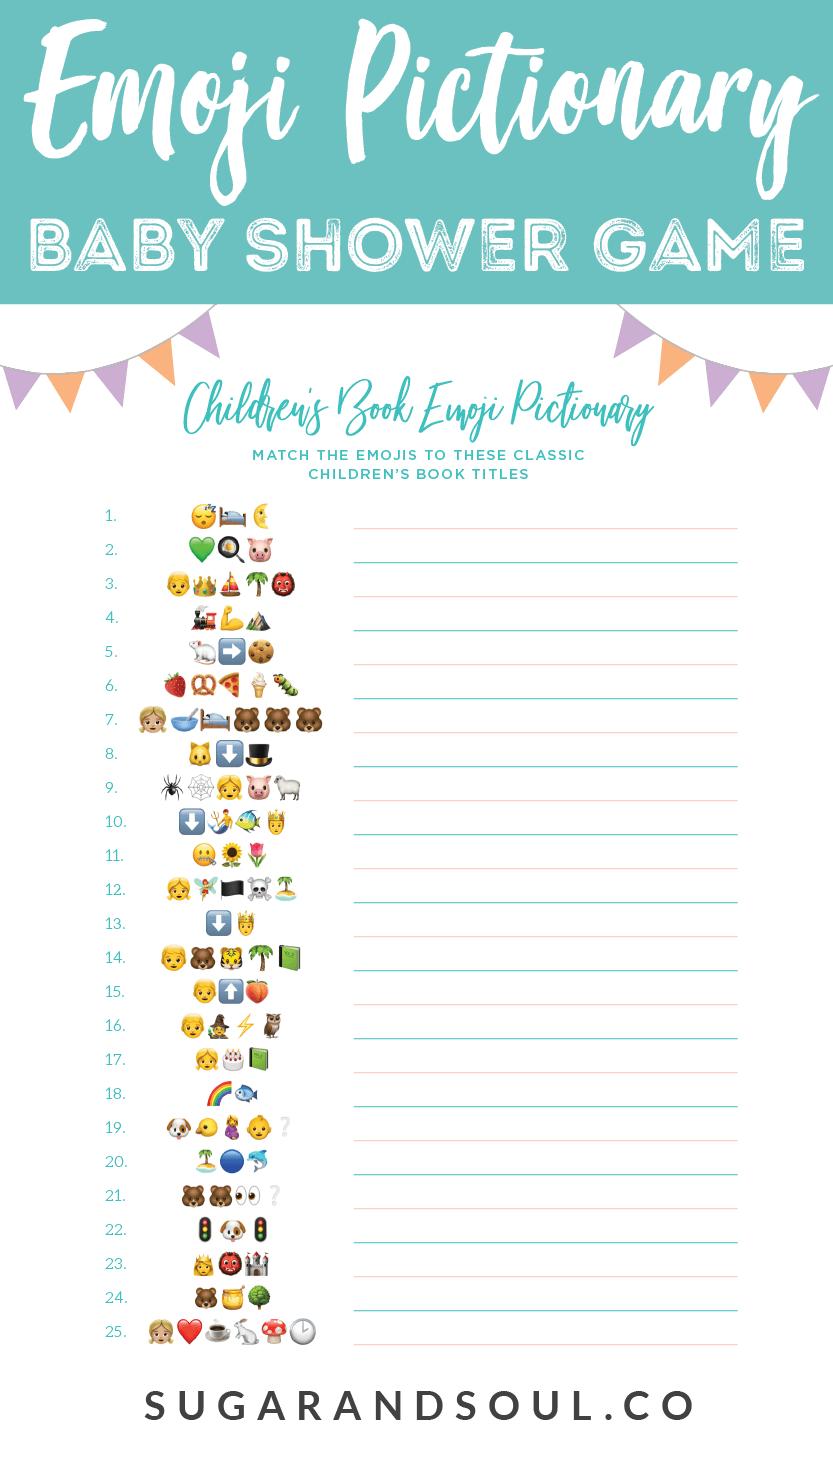 Baby Shower Emoji Pictionary : shower, emoji, pictionary, Children's, Emoji, Pictionary, Shower, Printable, Games,, Storybook